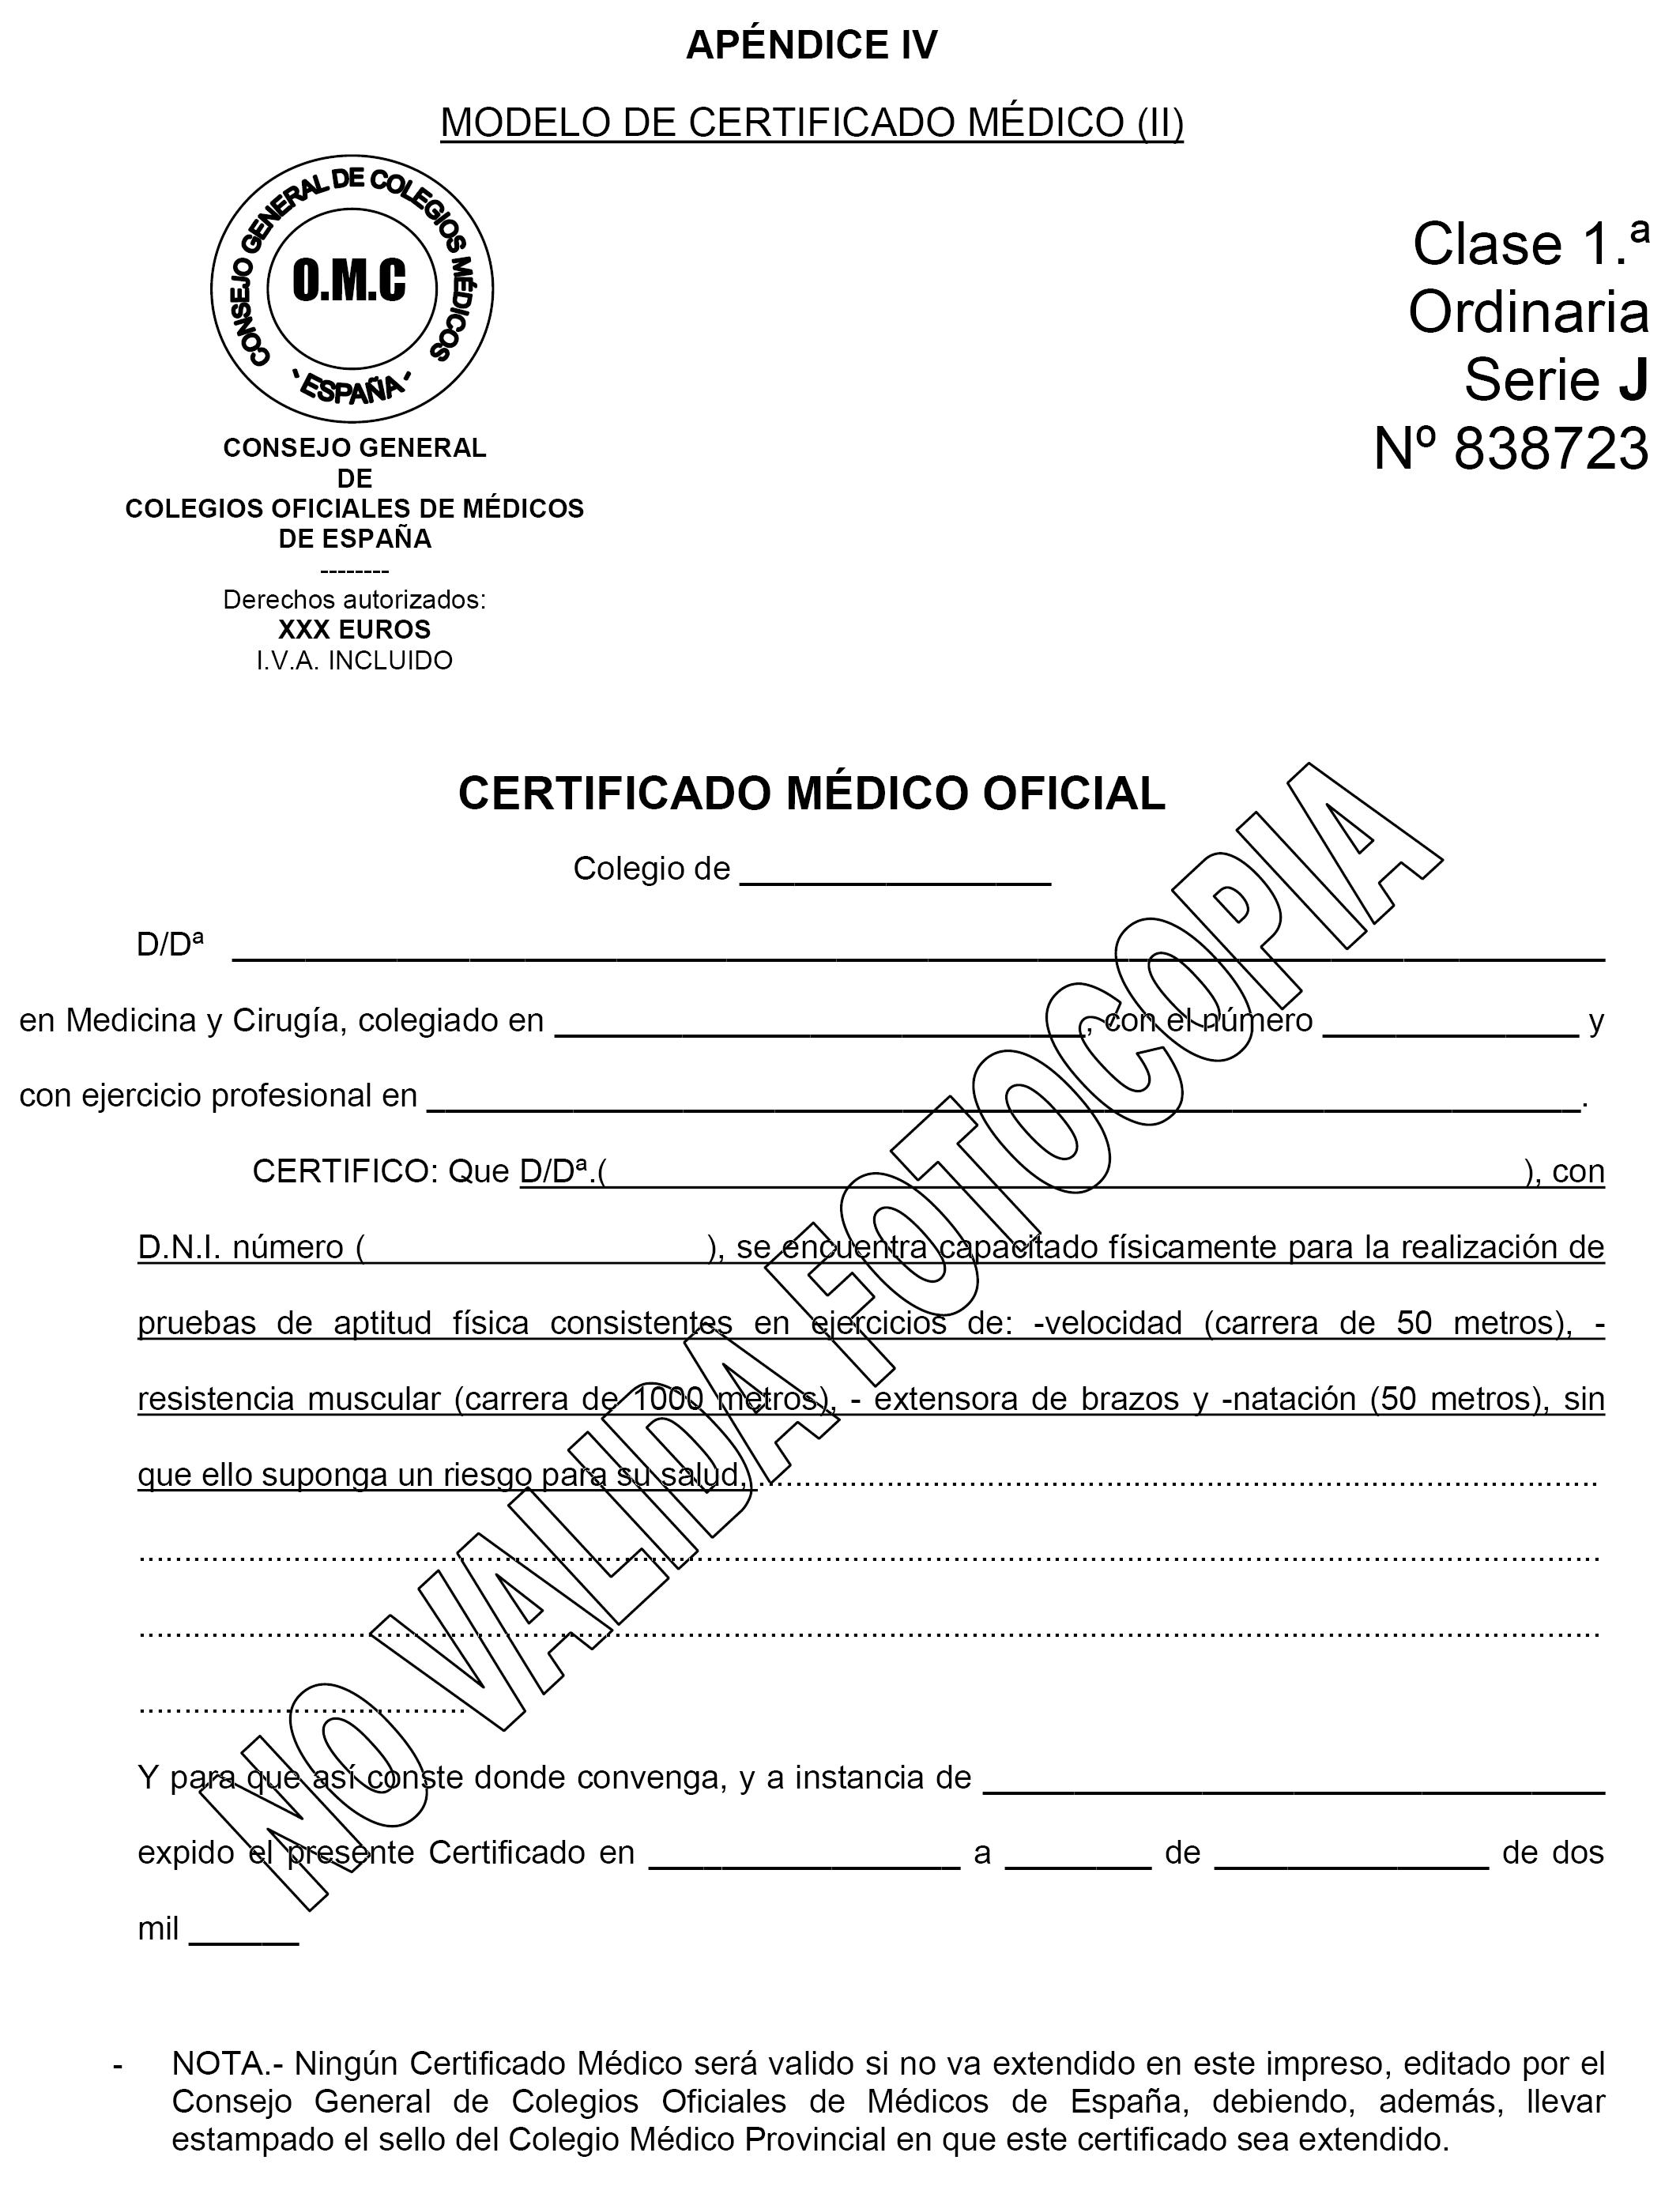 BOE.es - Documento BOE-A-2017-4809